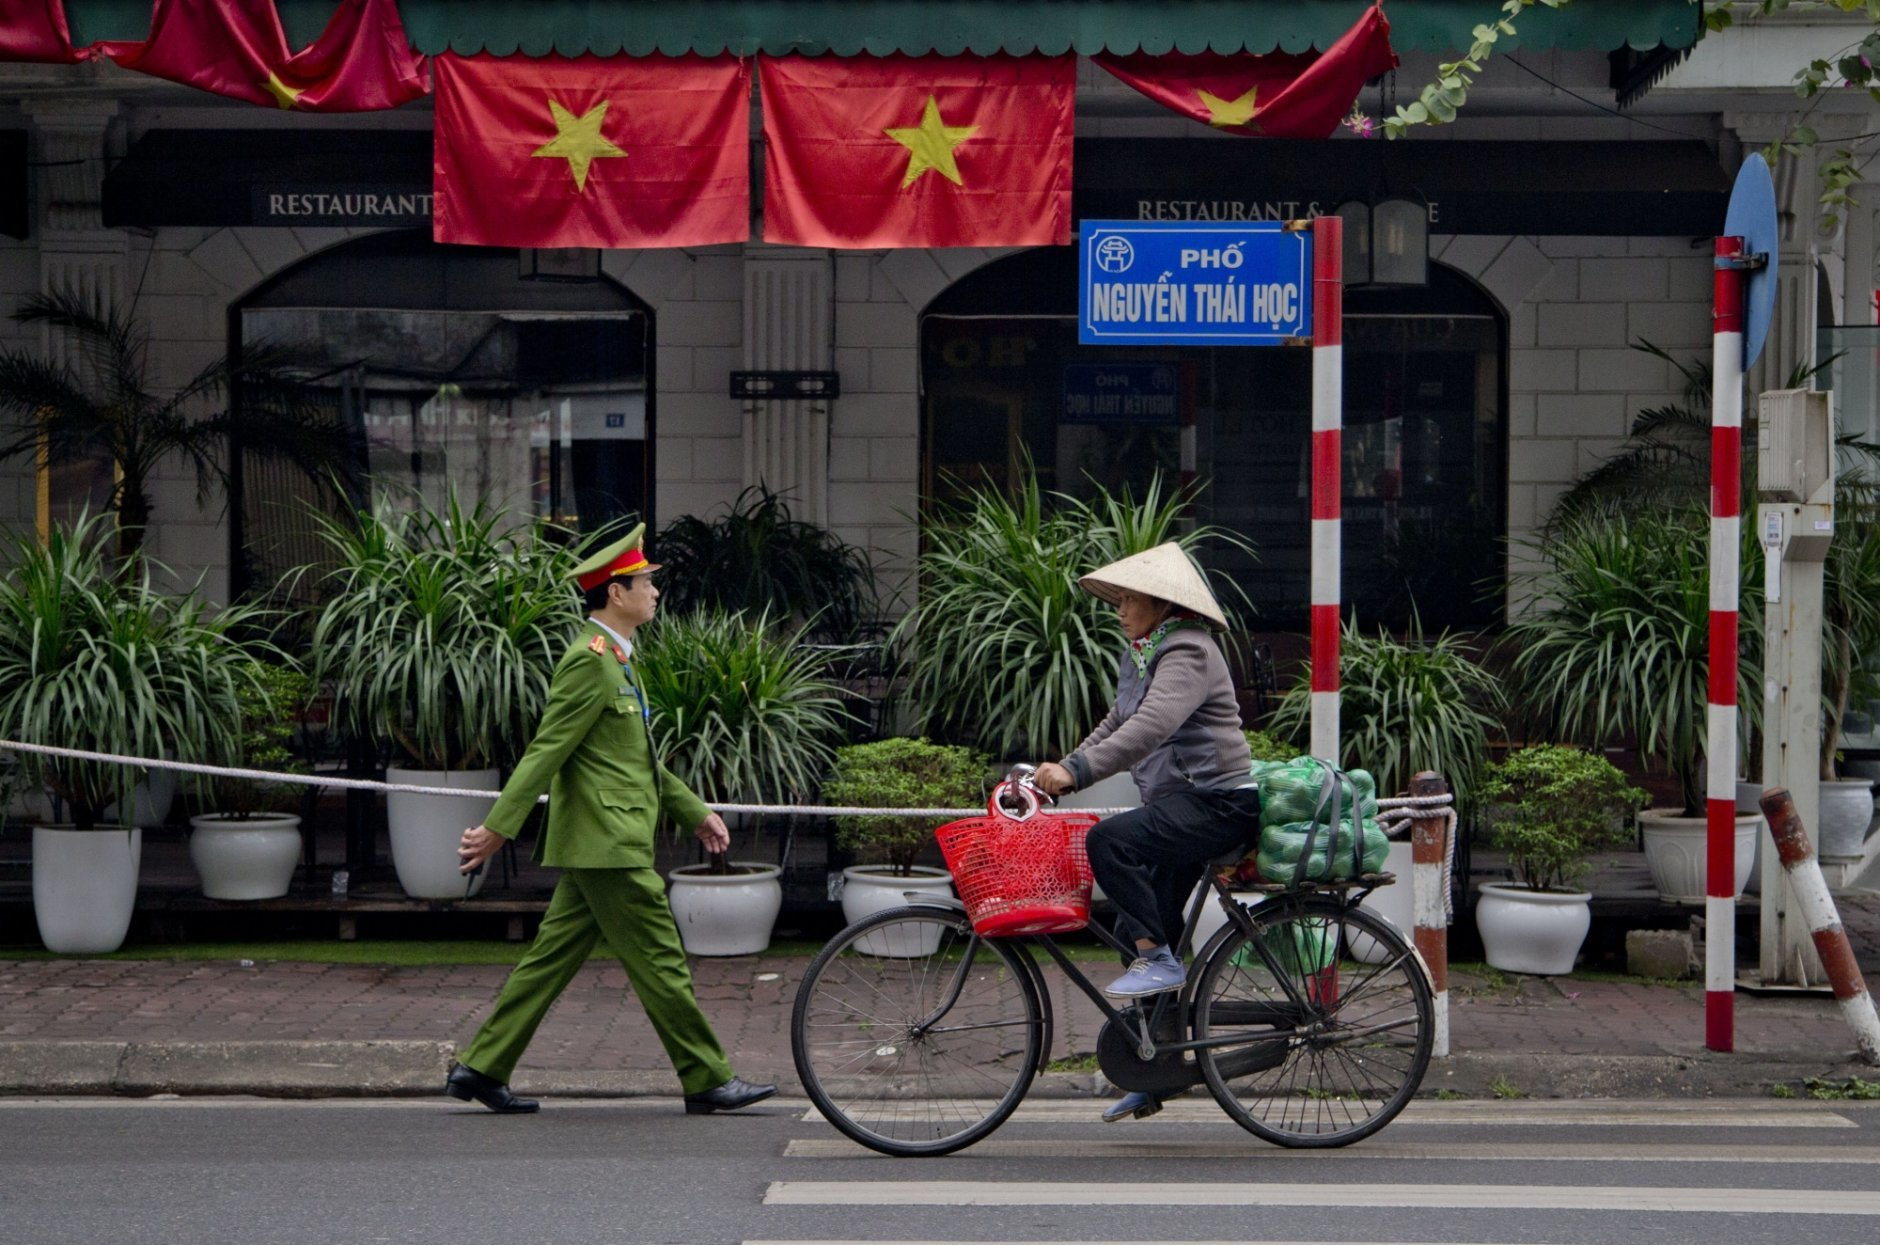 A woman rides a bicycle as a policeman walks past Vietnam flags in Hanoi, Vietnam, Wednesday, Feb. 27, 2019, as Vietnam prepare to facilitate the second summit between U.S President Donald Trump and North Korean leader Kim Jong Un in Hanoi. (AP Photo/Gemunu Amarasinghe)